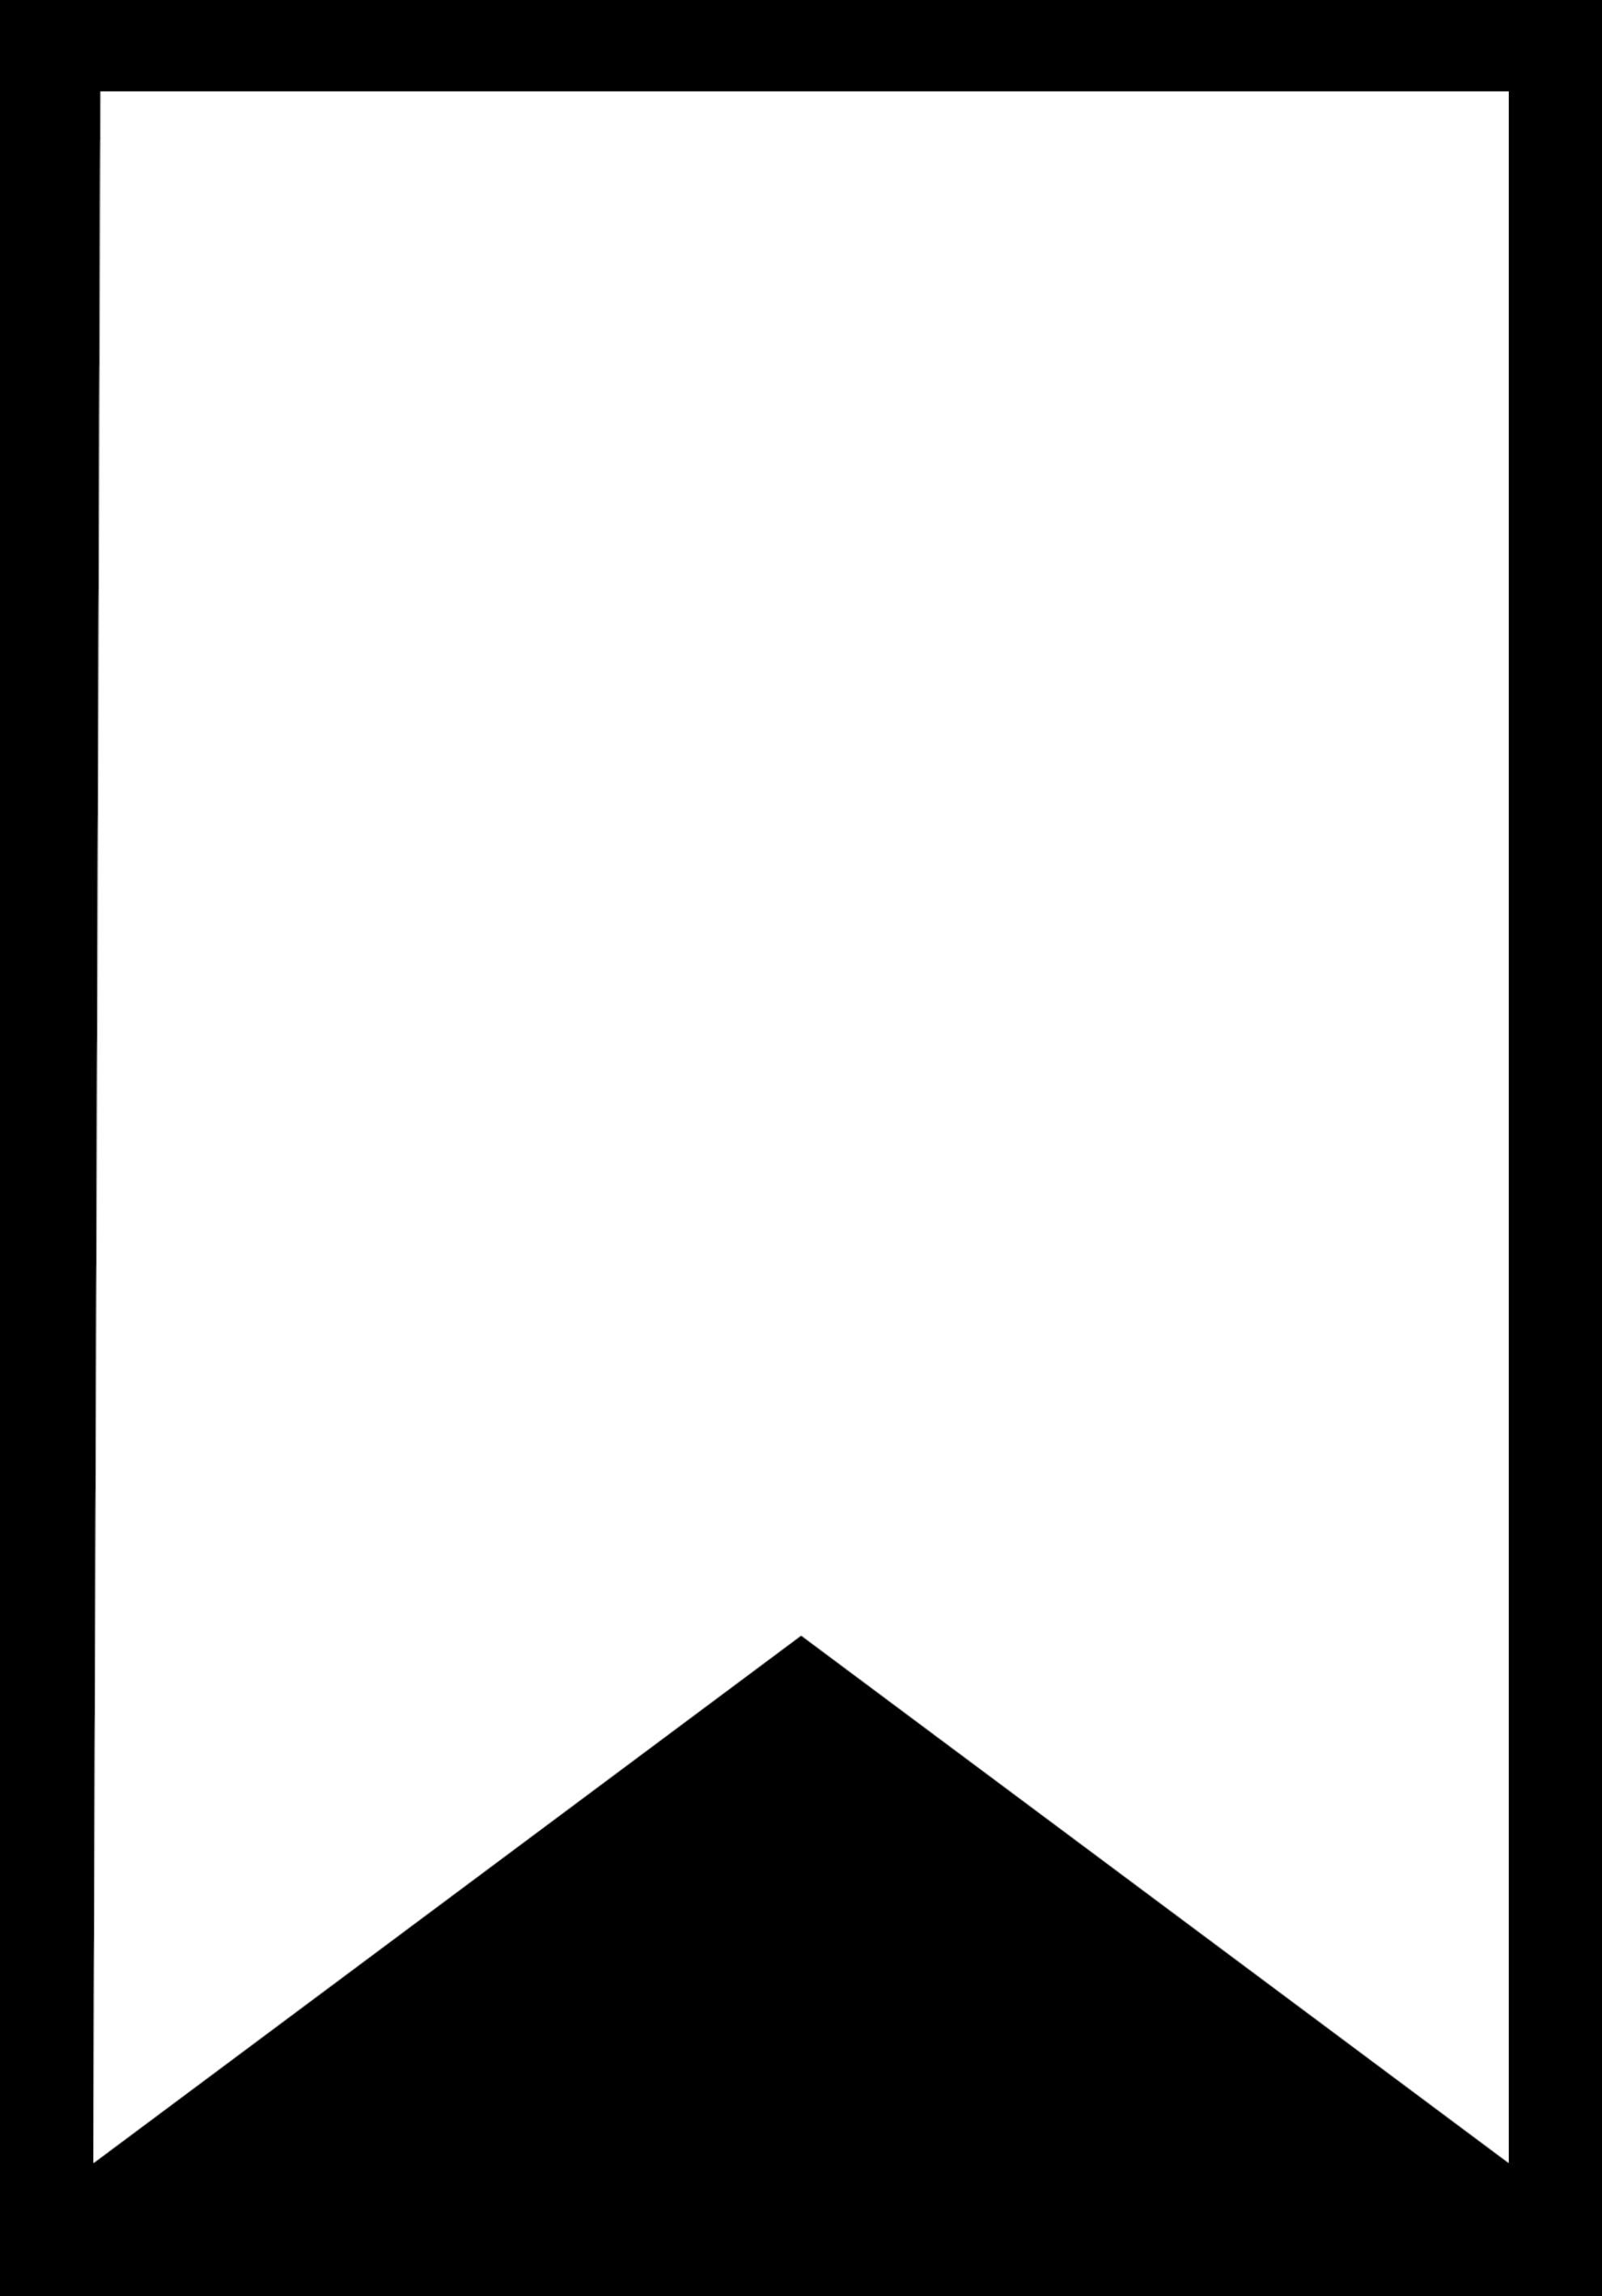 printable flag template pin by carrington nye on crafting pennant banner template printable flag